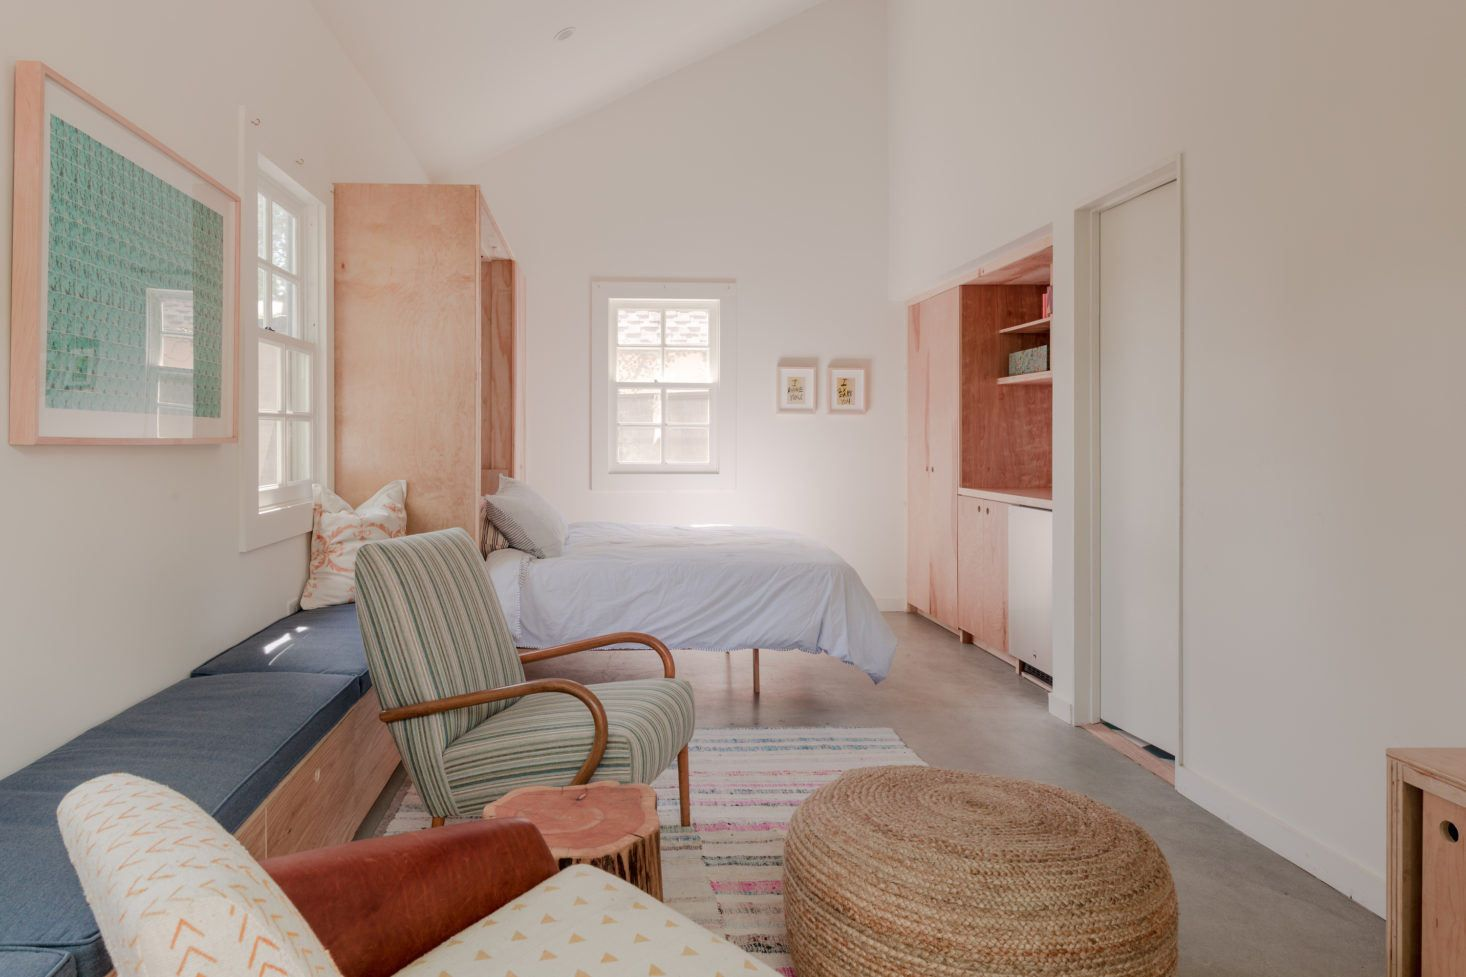 christine-lennon-guest-barn-guest-room-stephen-paul-paul-anderson-1466x977